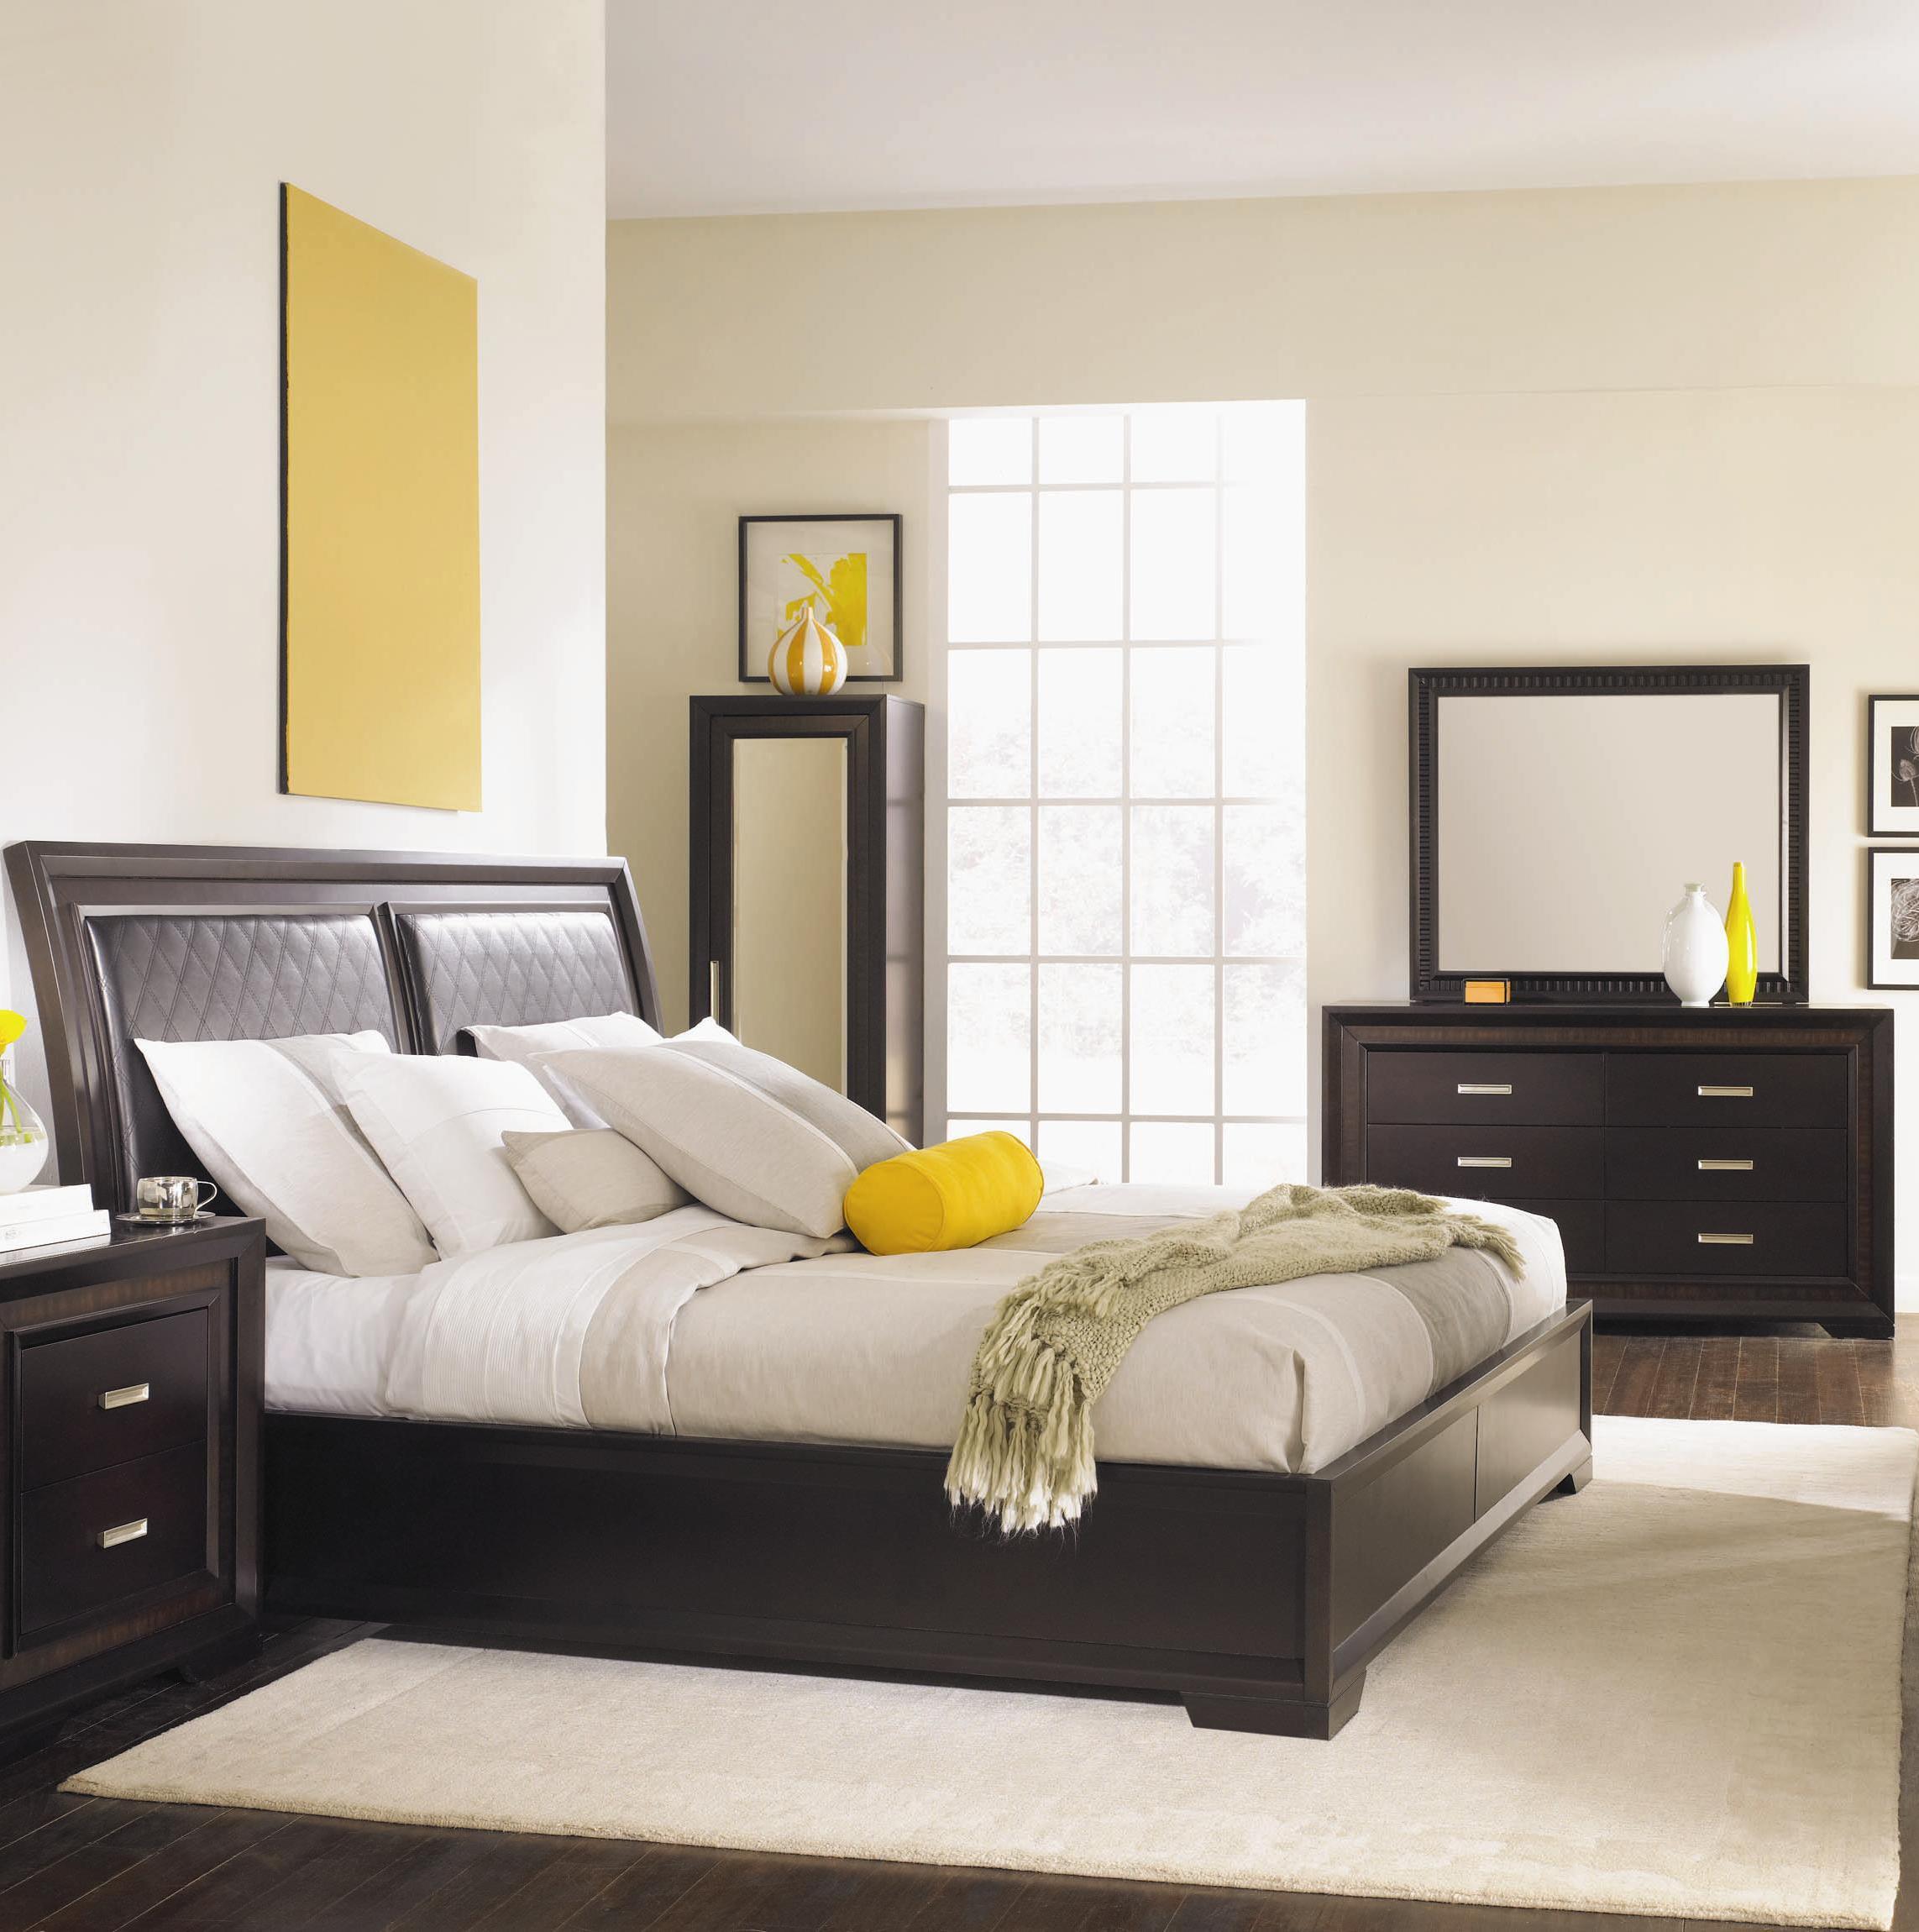 Najarian Brentwood 5 Piece King Bedroom Set - Item Number: BRENTWOOD-5BEDK